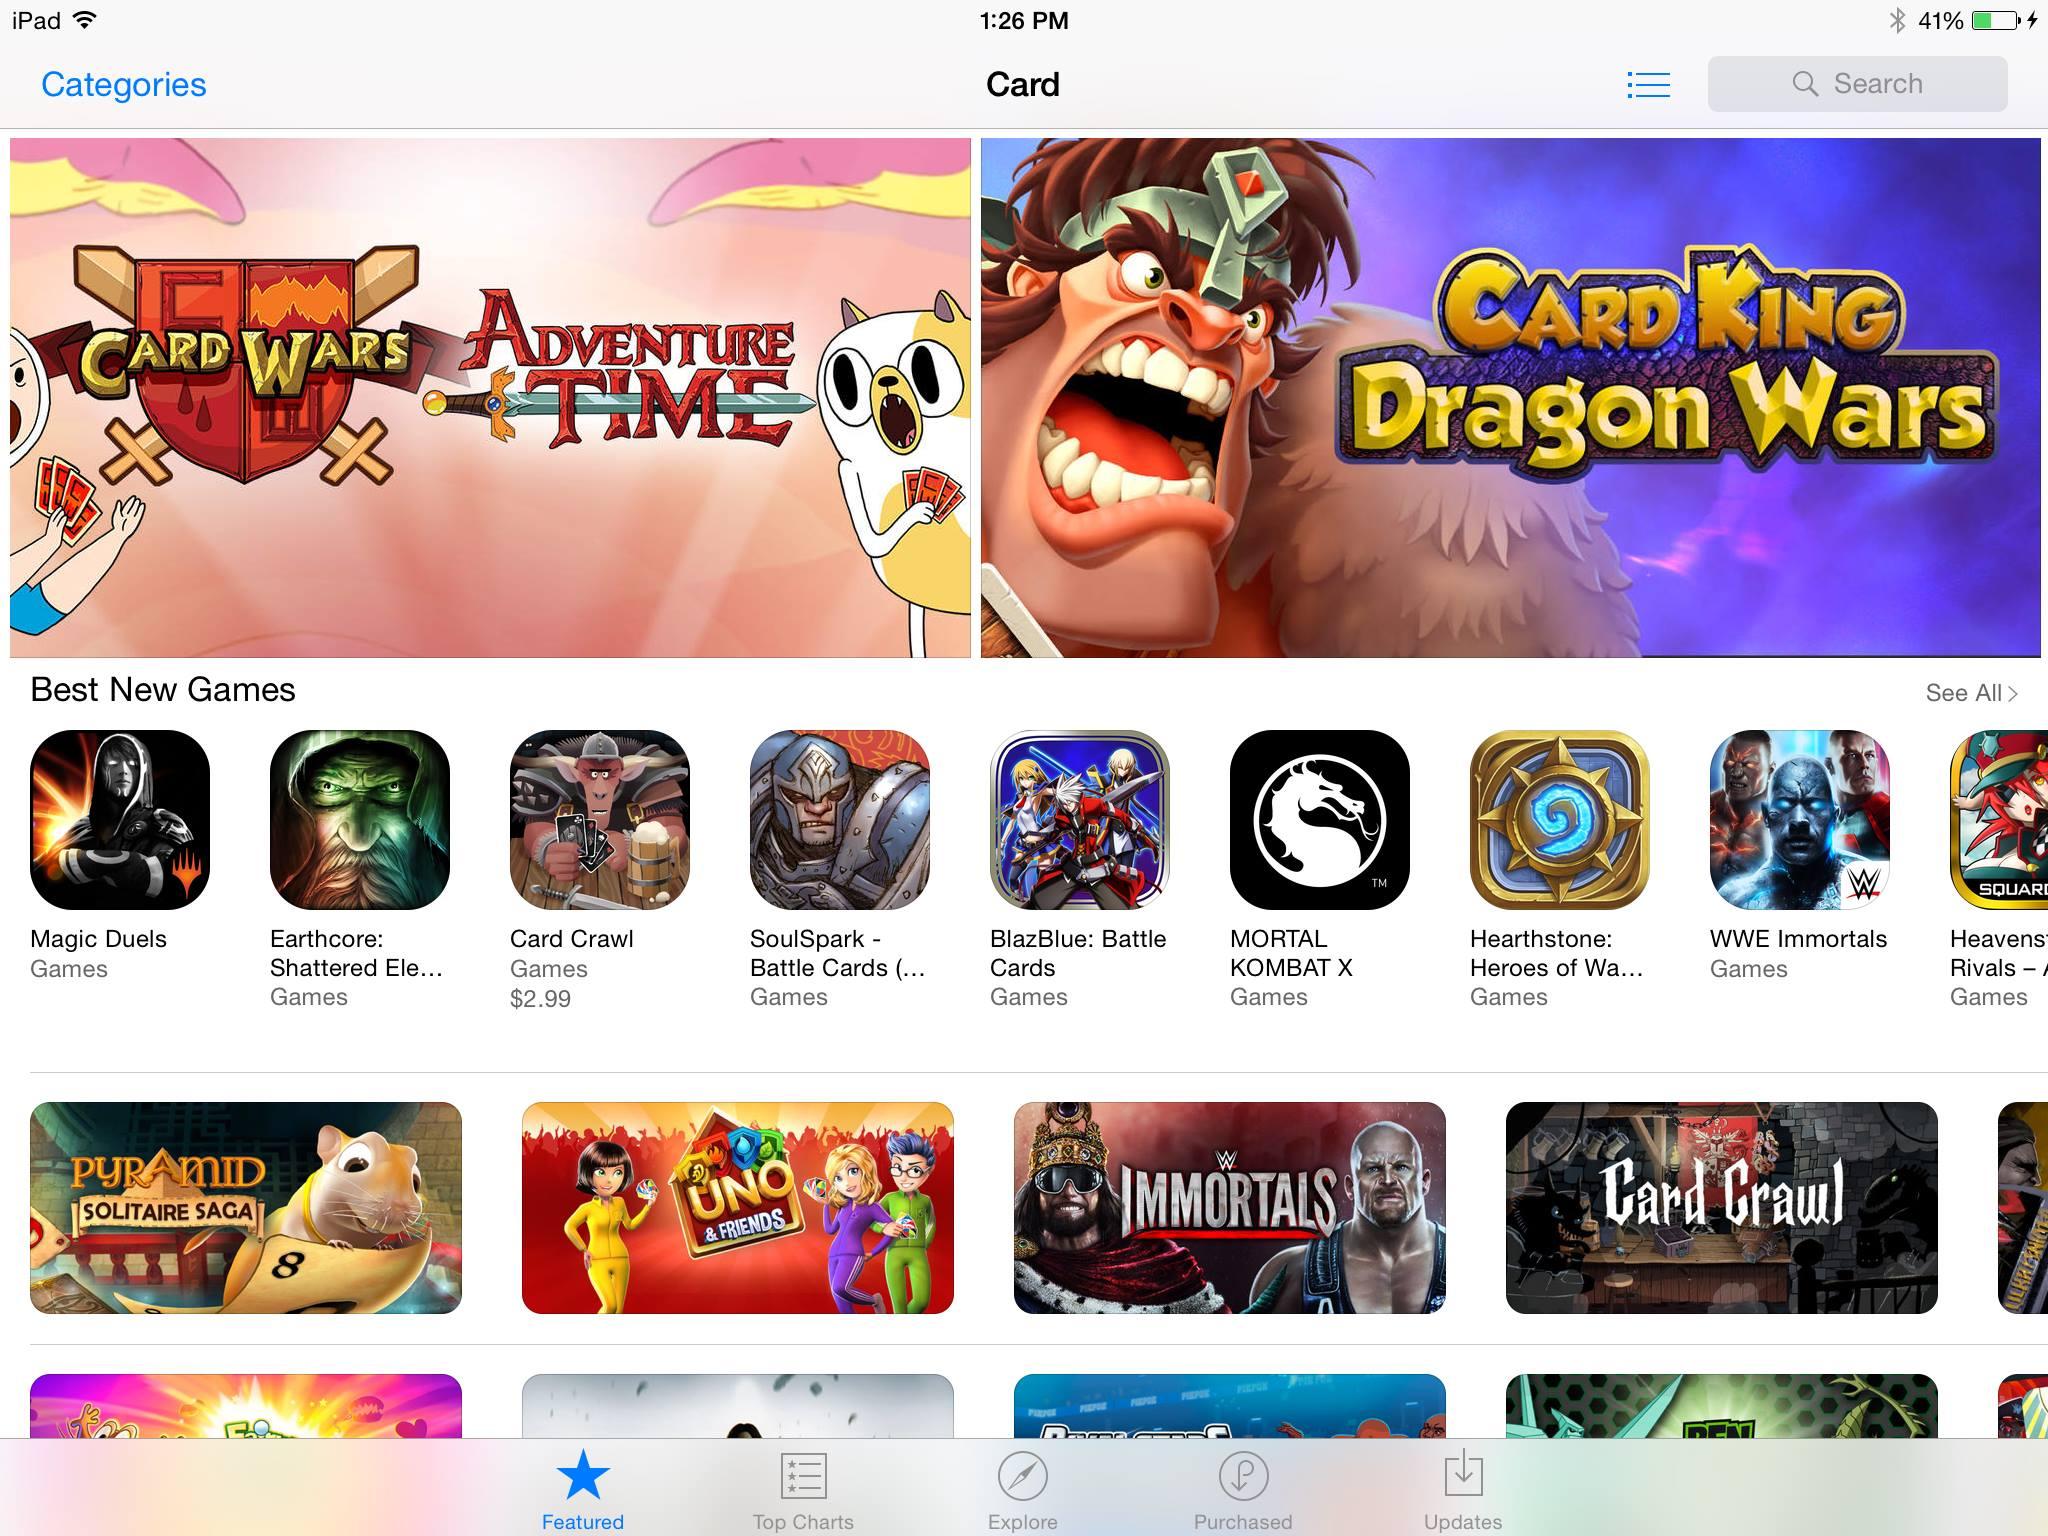 new-game-dragon-wars